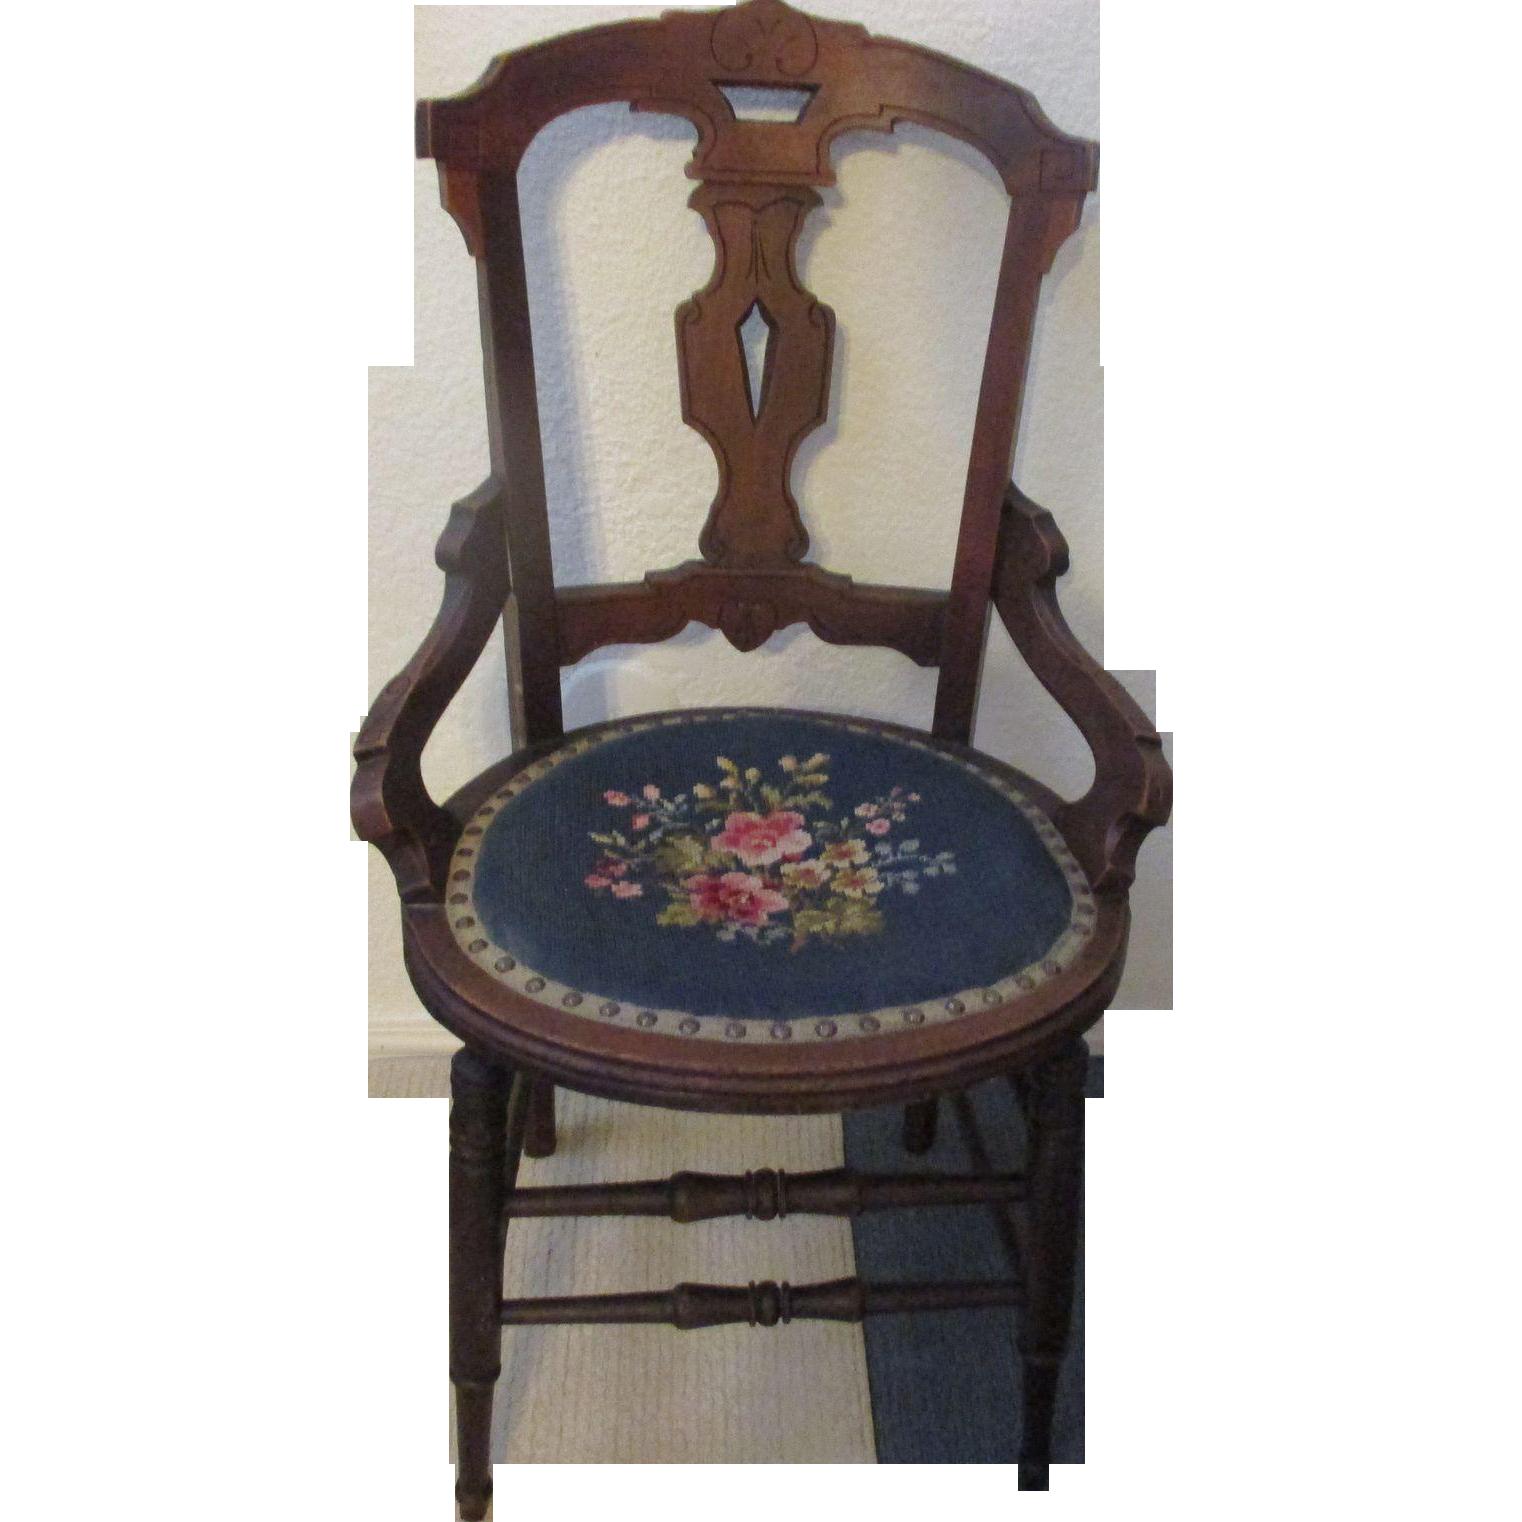 Antique sleek 1880 1910 light weight bedroom chair or